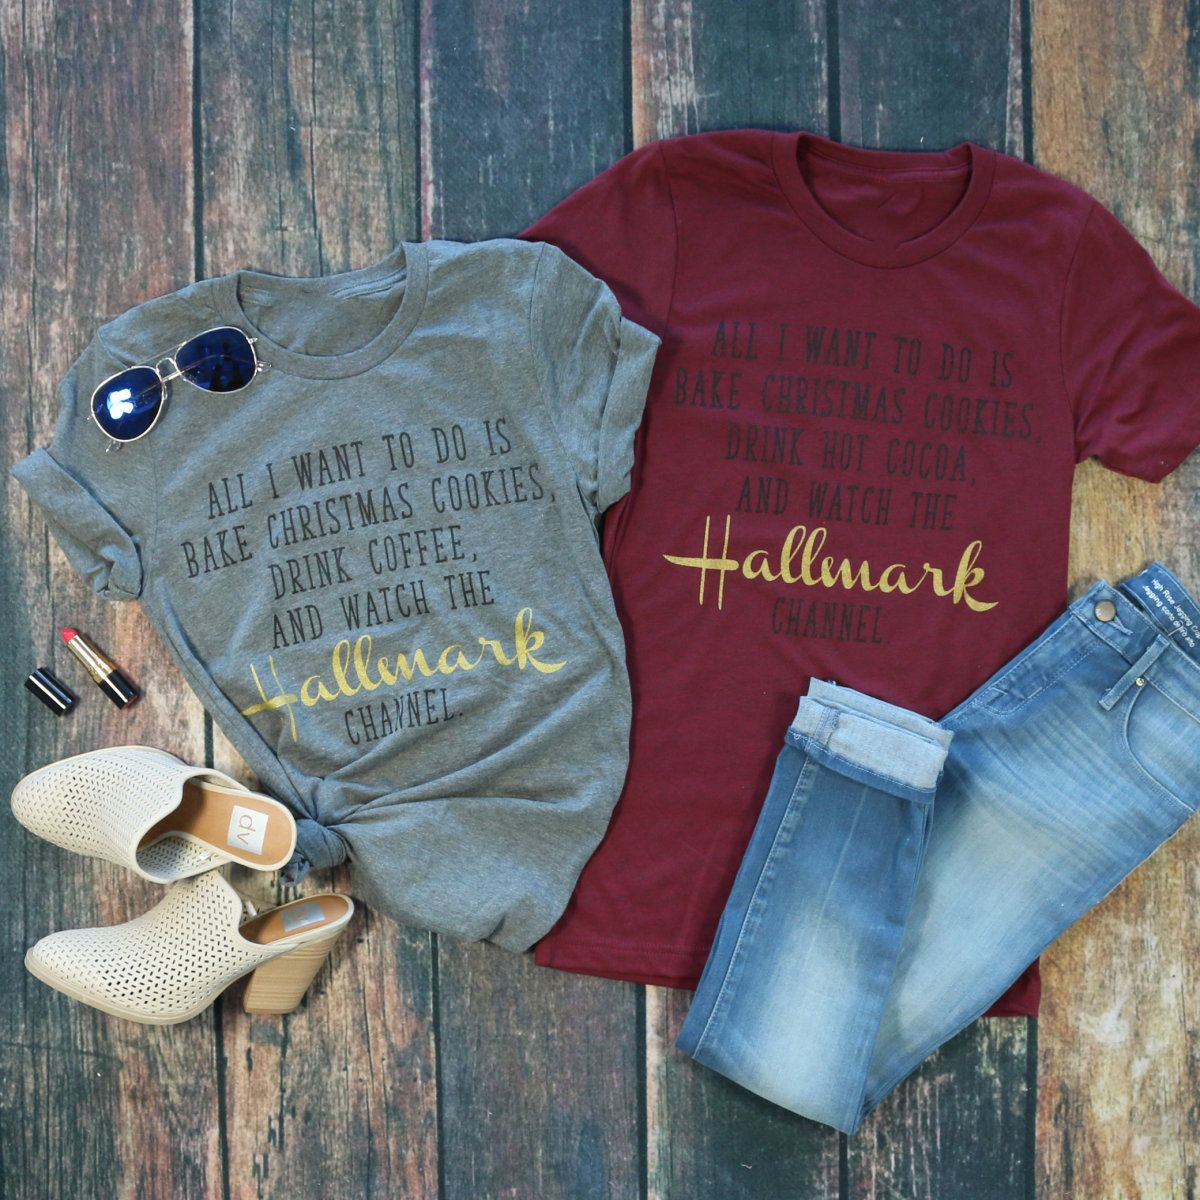 Hallmark Christmas Movie Tees Holiday Shirt Ideas Christmas Movie Shirts Holiday Shirts